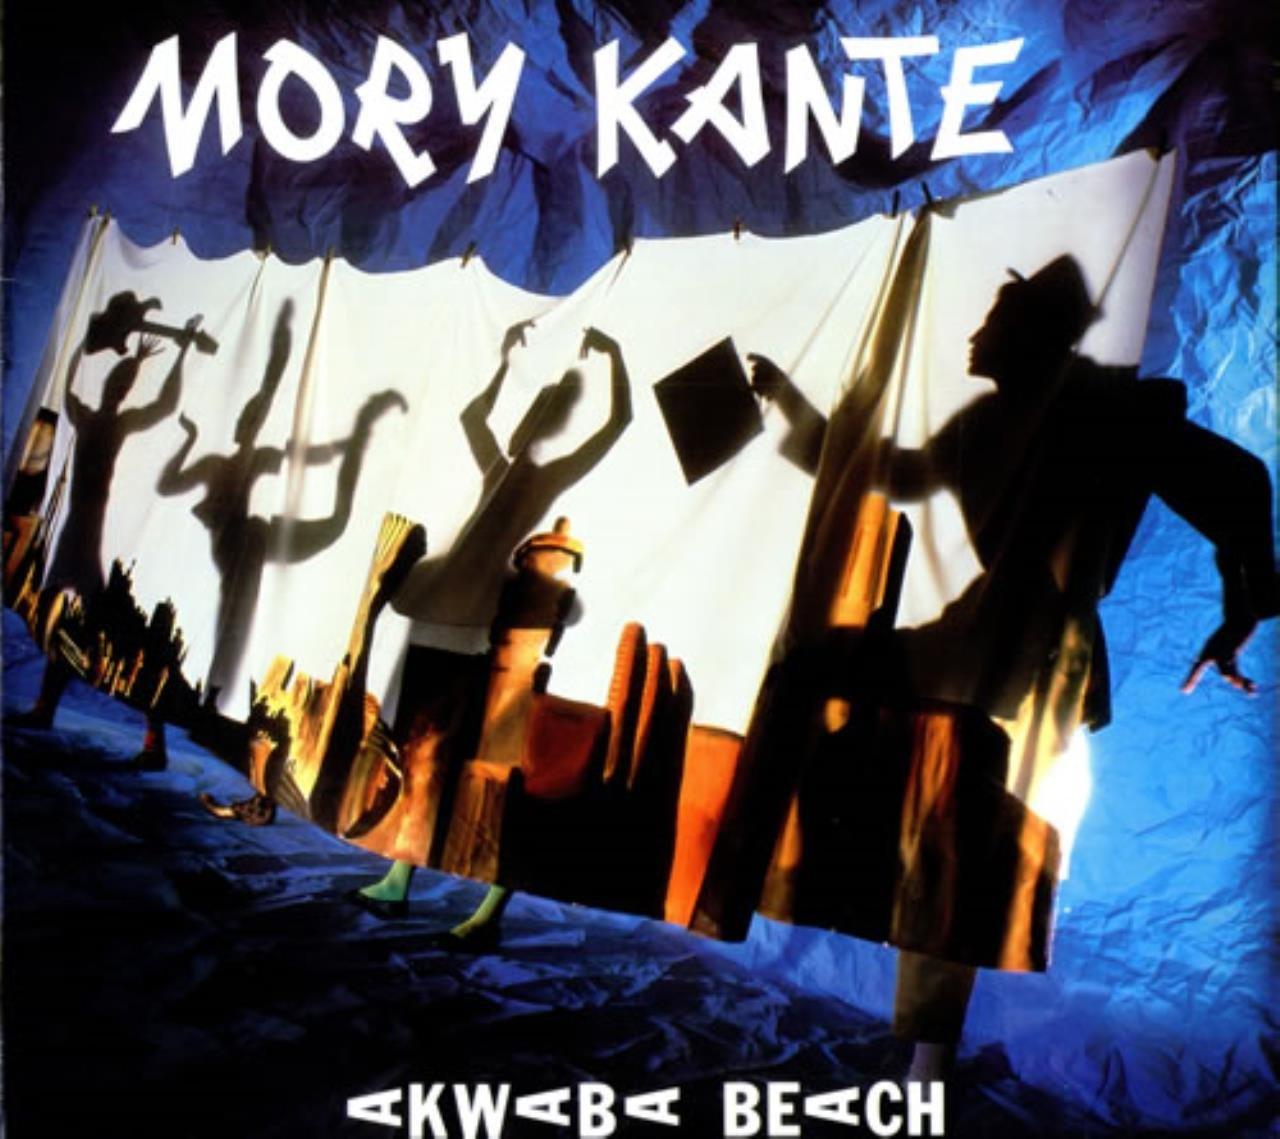 Akwaba Beach [Vinyl] by Barclay